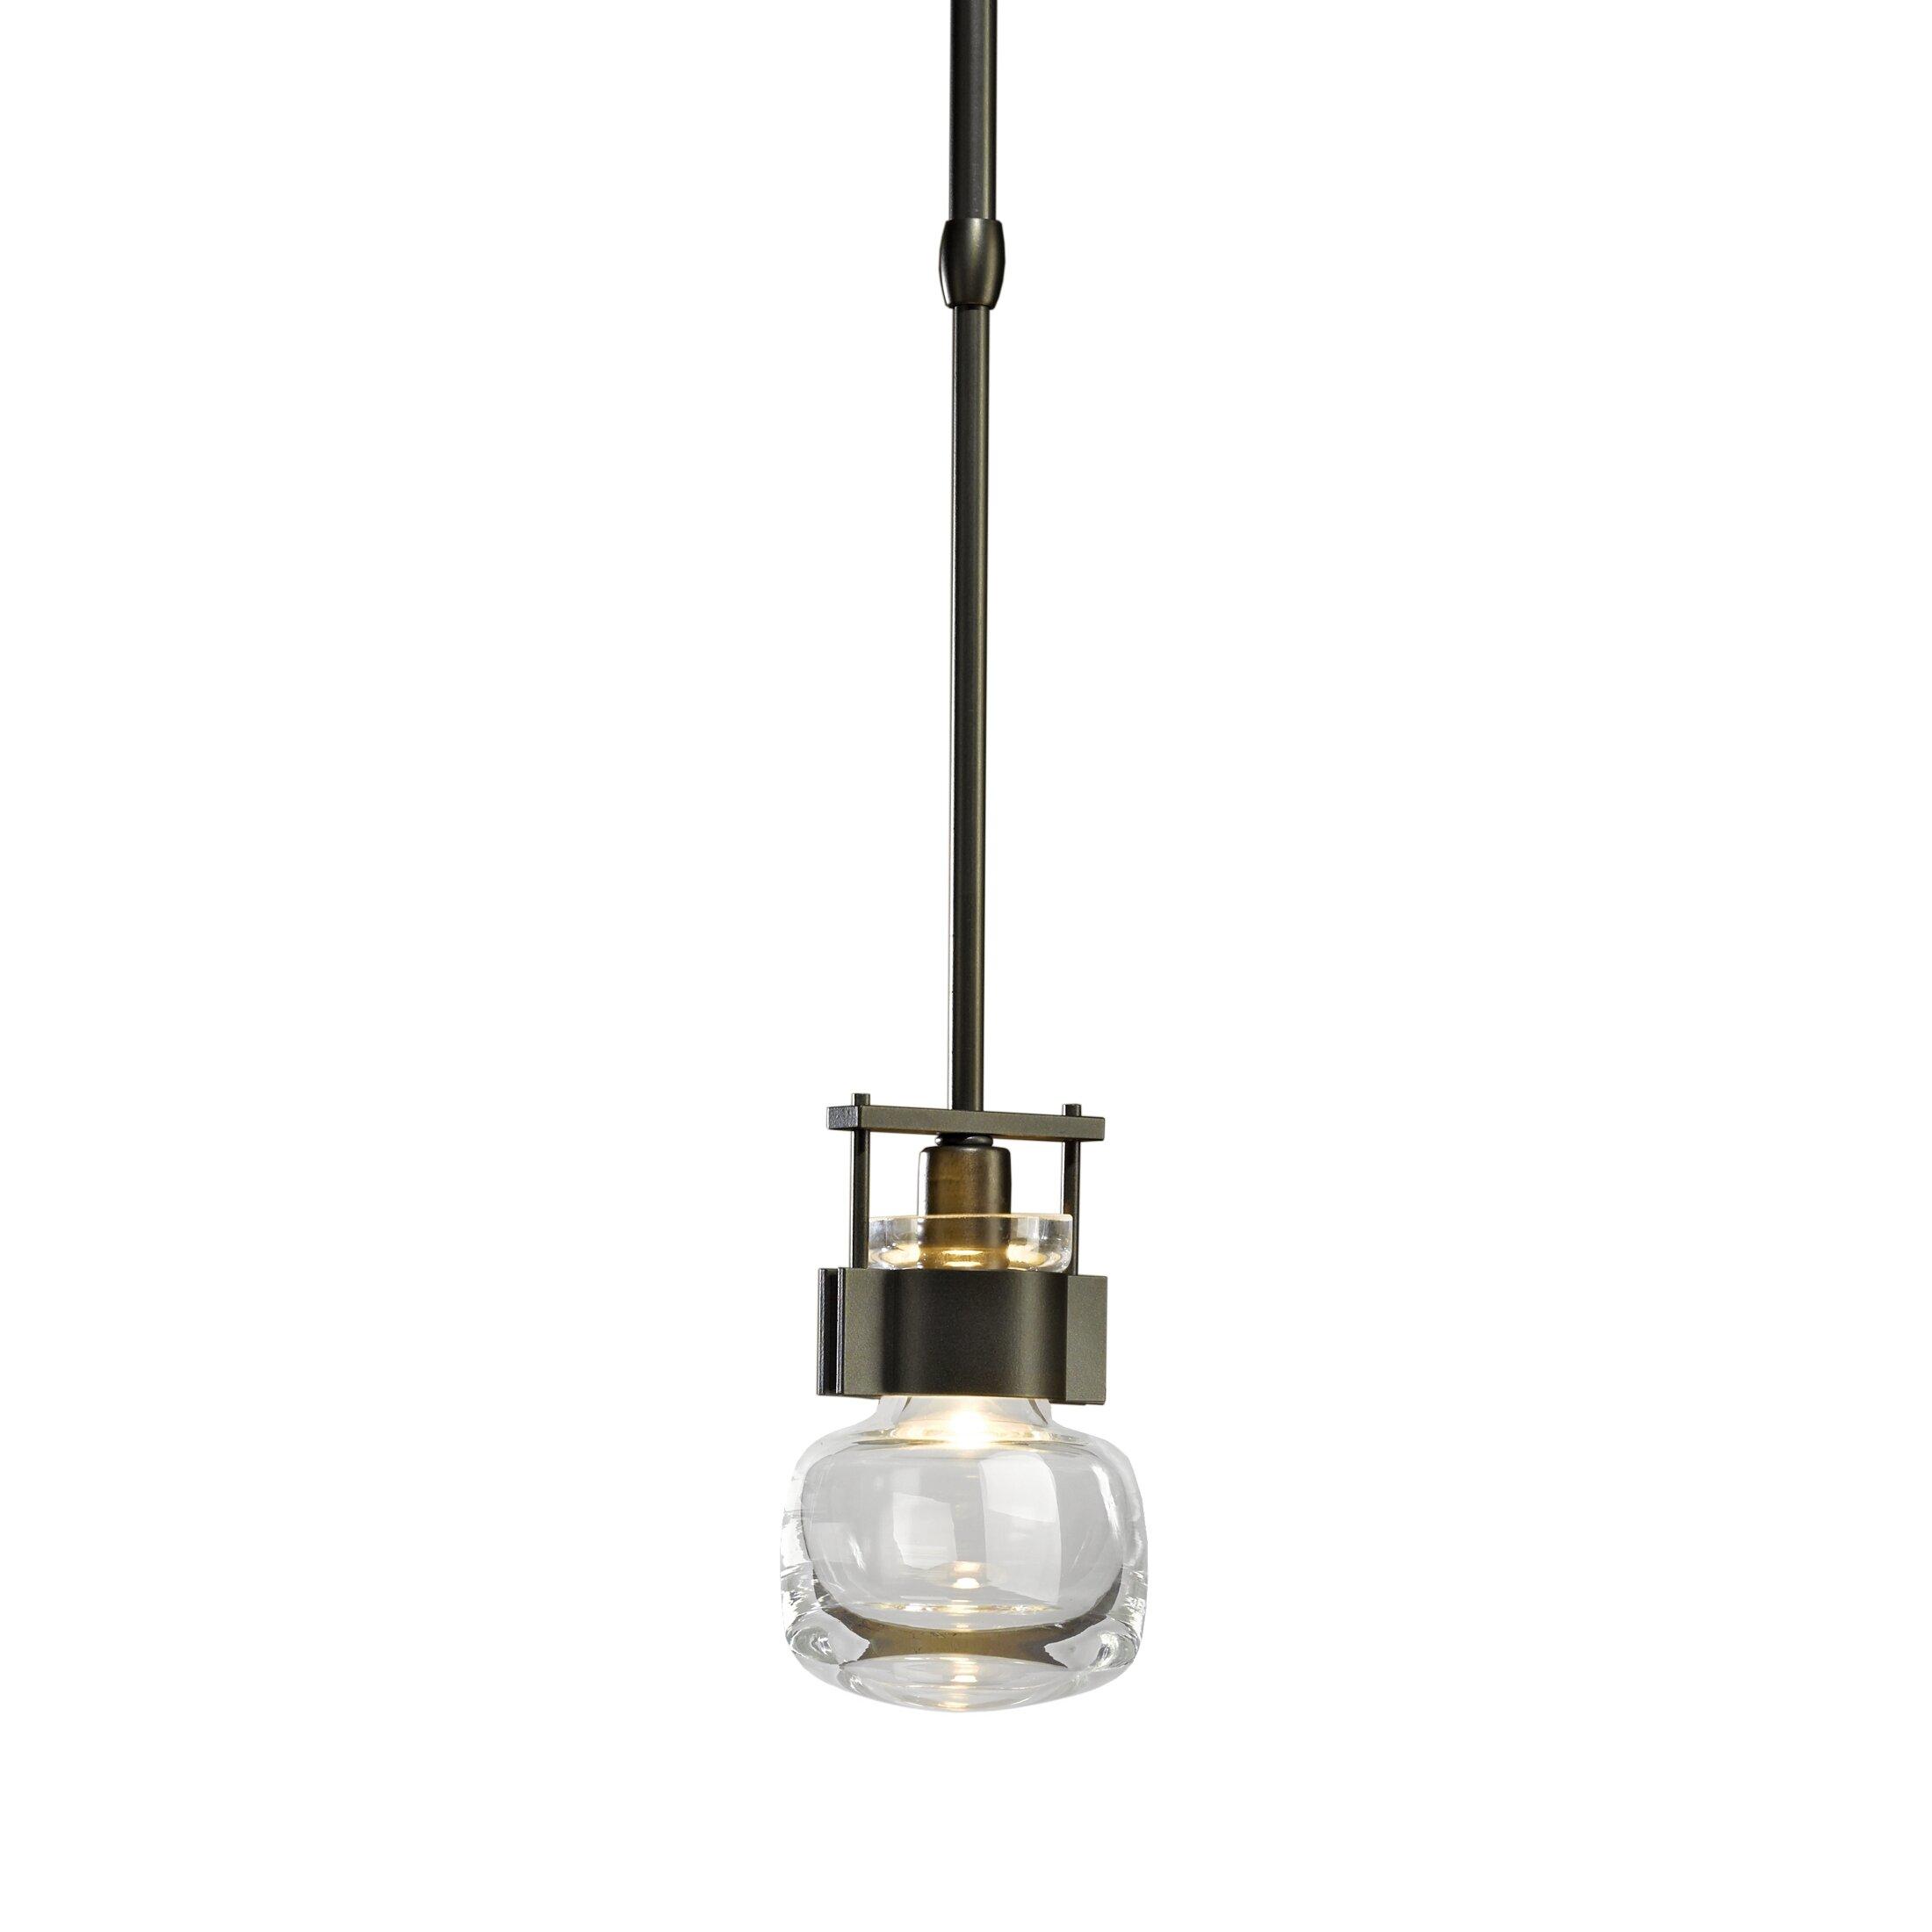 Hubbardton Forge Cuff 1 Light Single Jar Pendant Wayfair